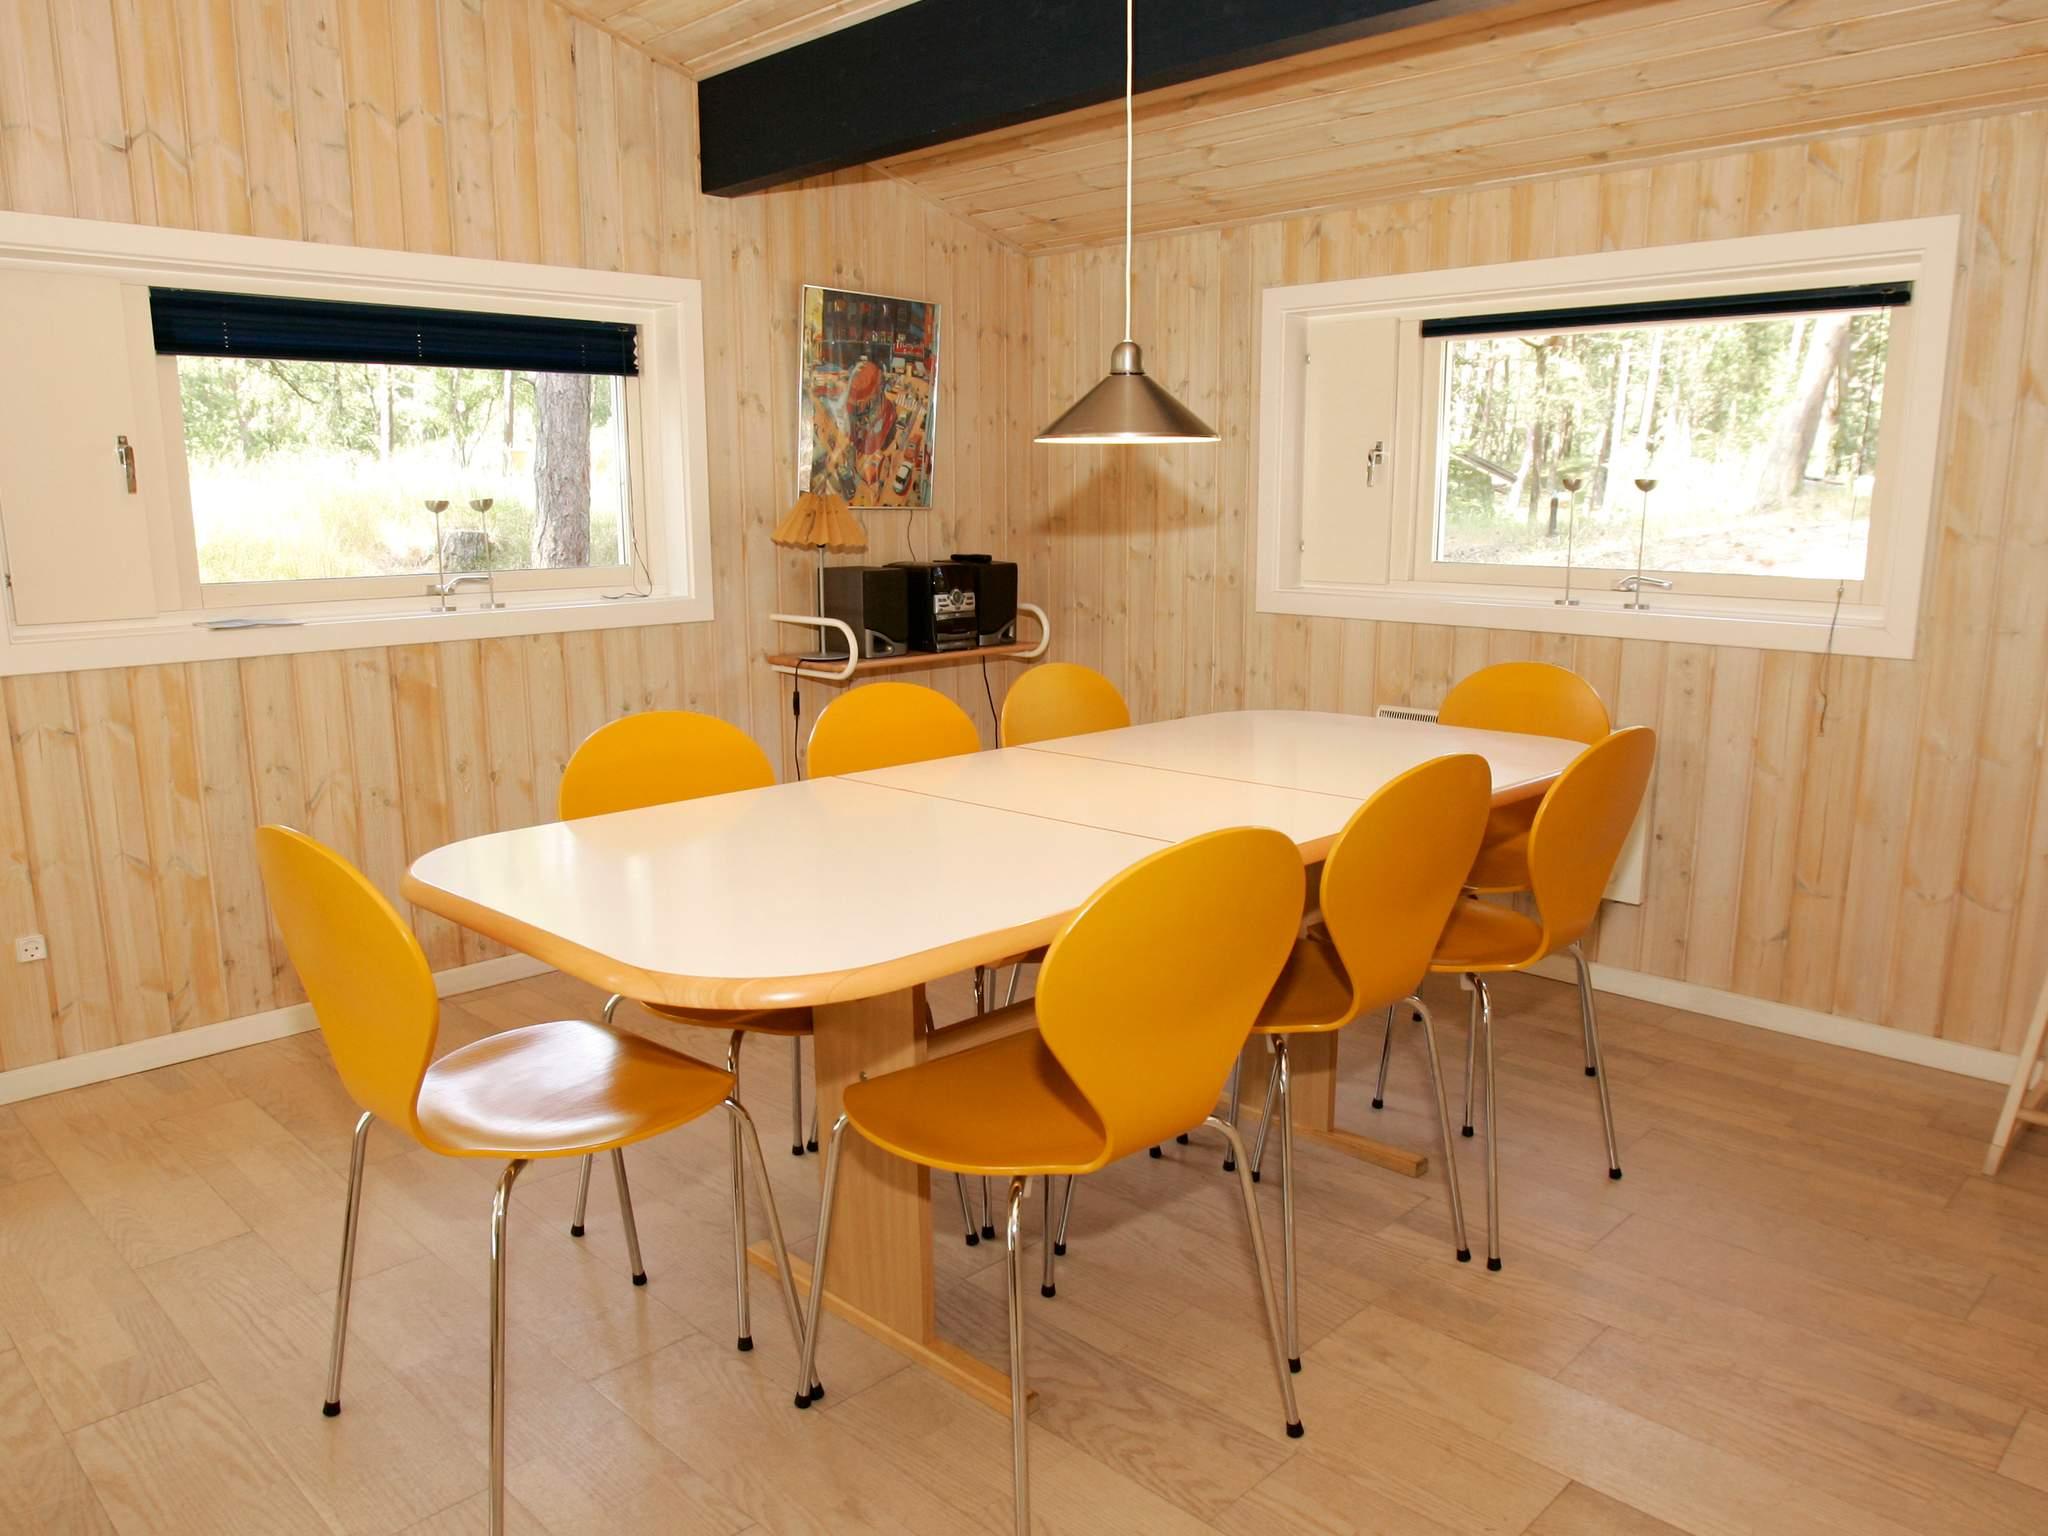 Ferienhaus Sommerodde (82541), Nexø, , Bornholm, Dänemark, Bild 7